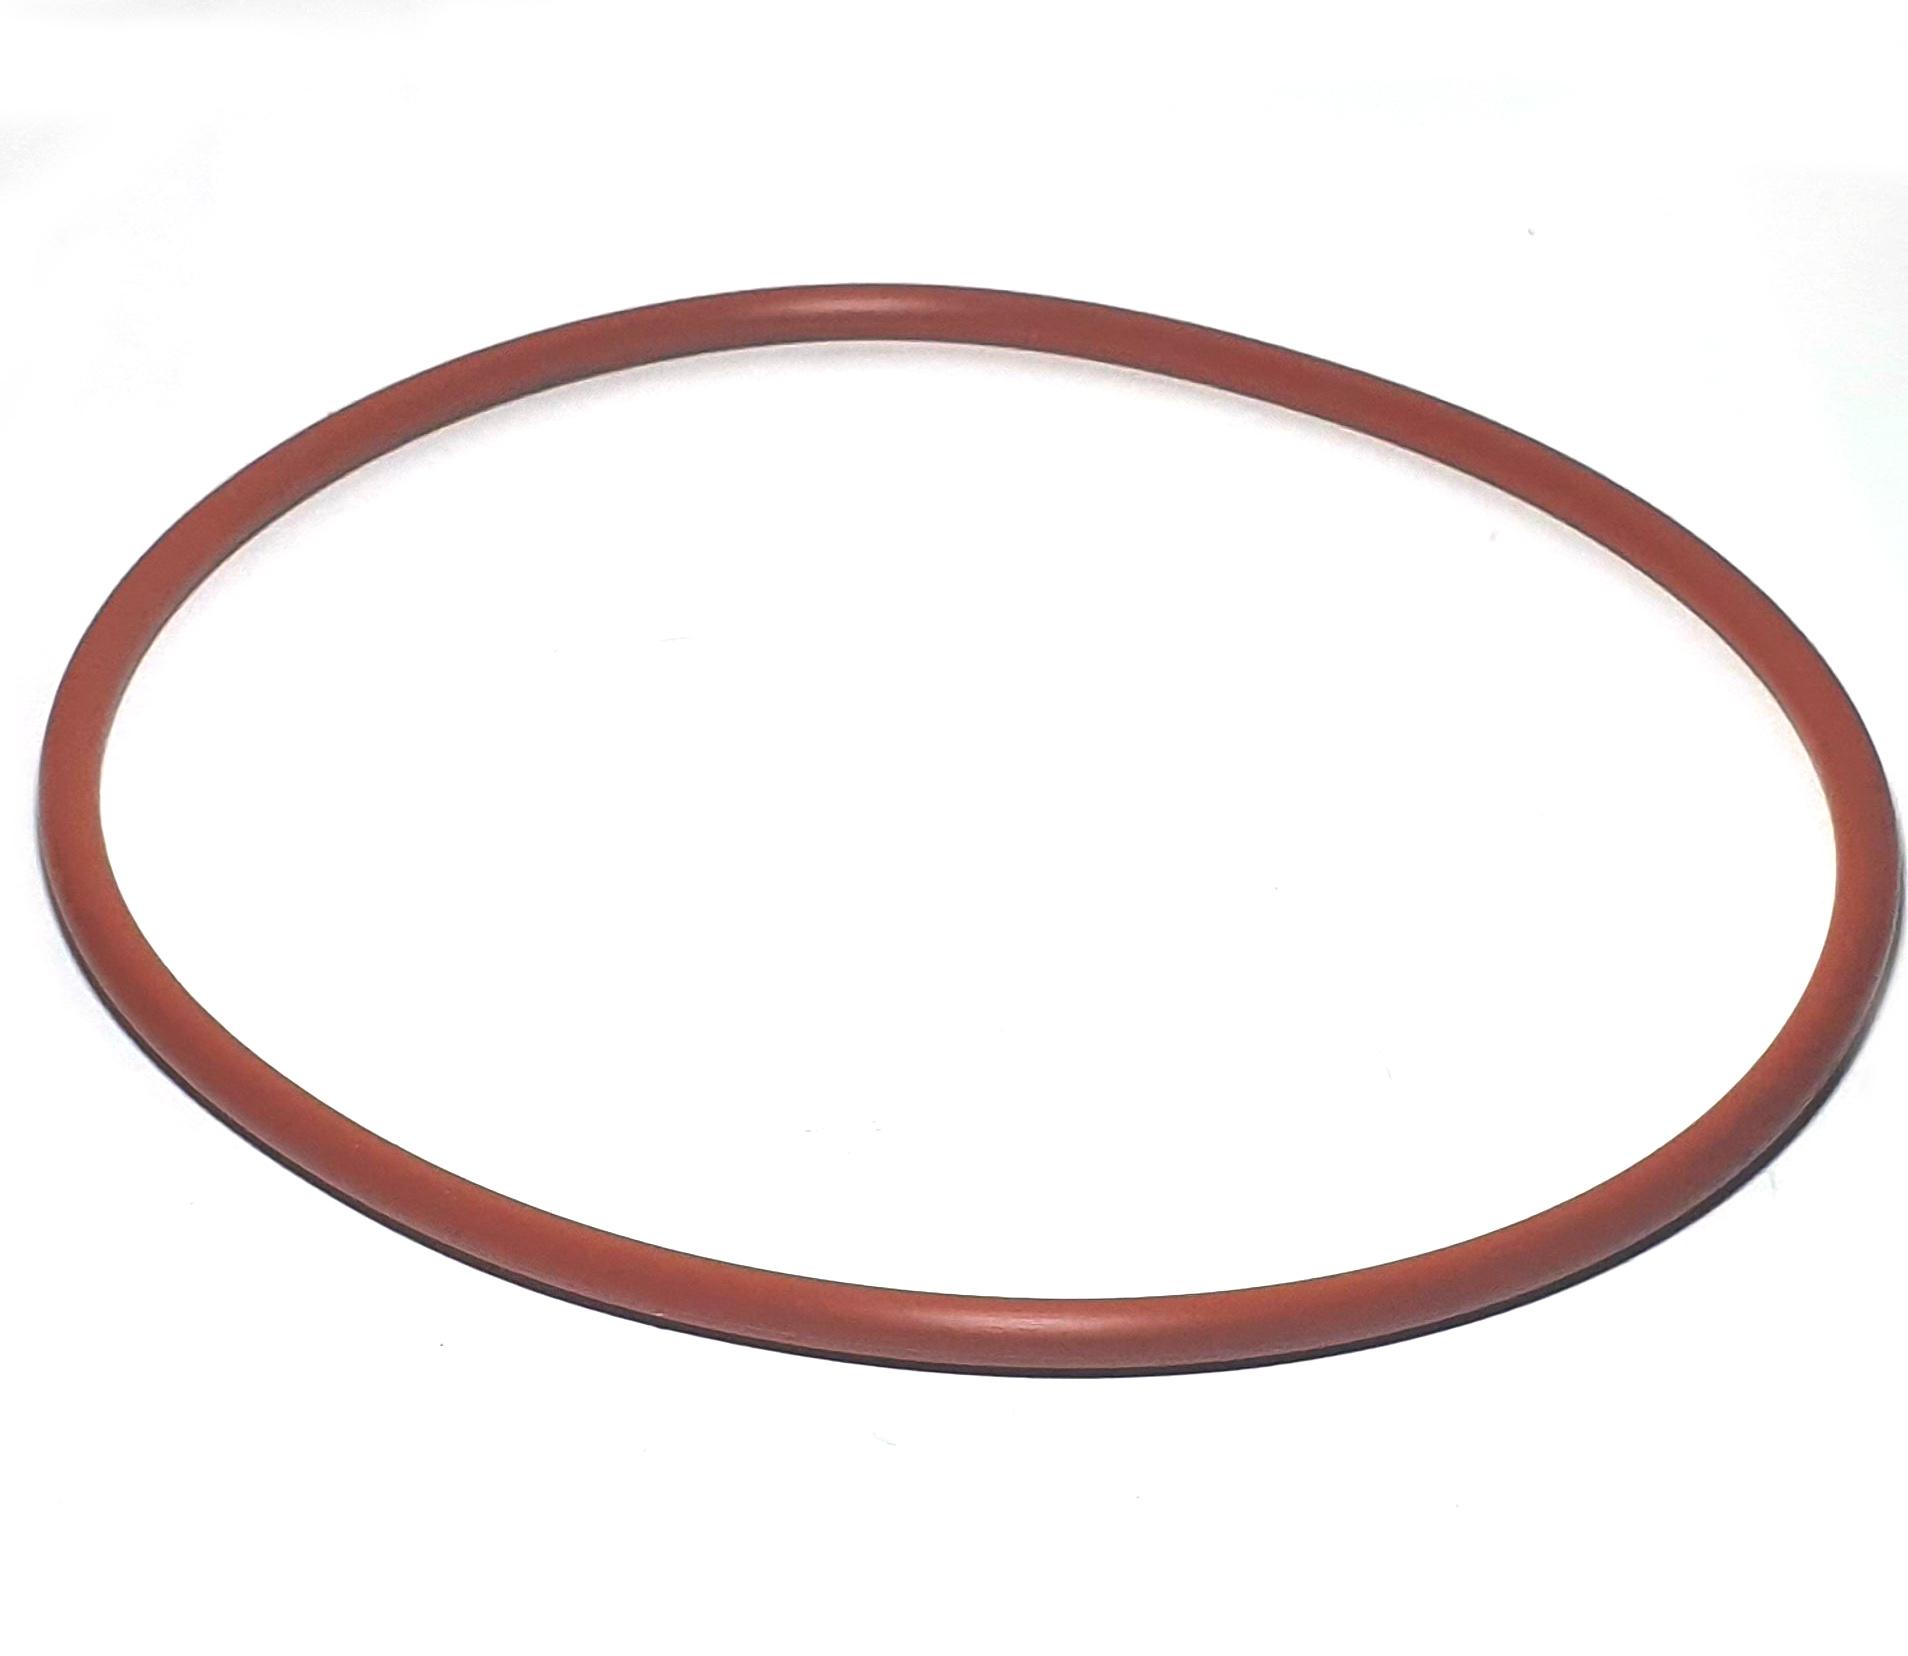 anel de ved bba d'agua mitsubishi S12H/S16R - pn F3156-16000